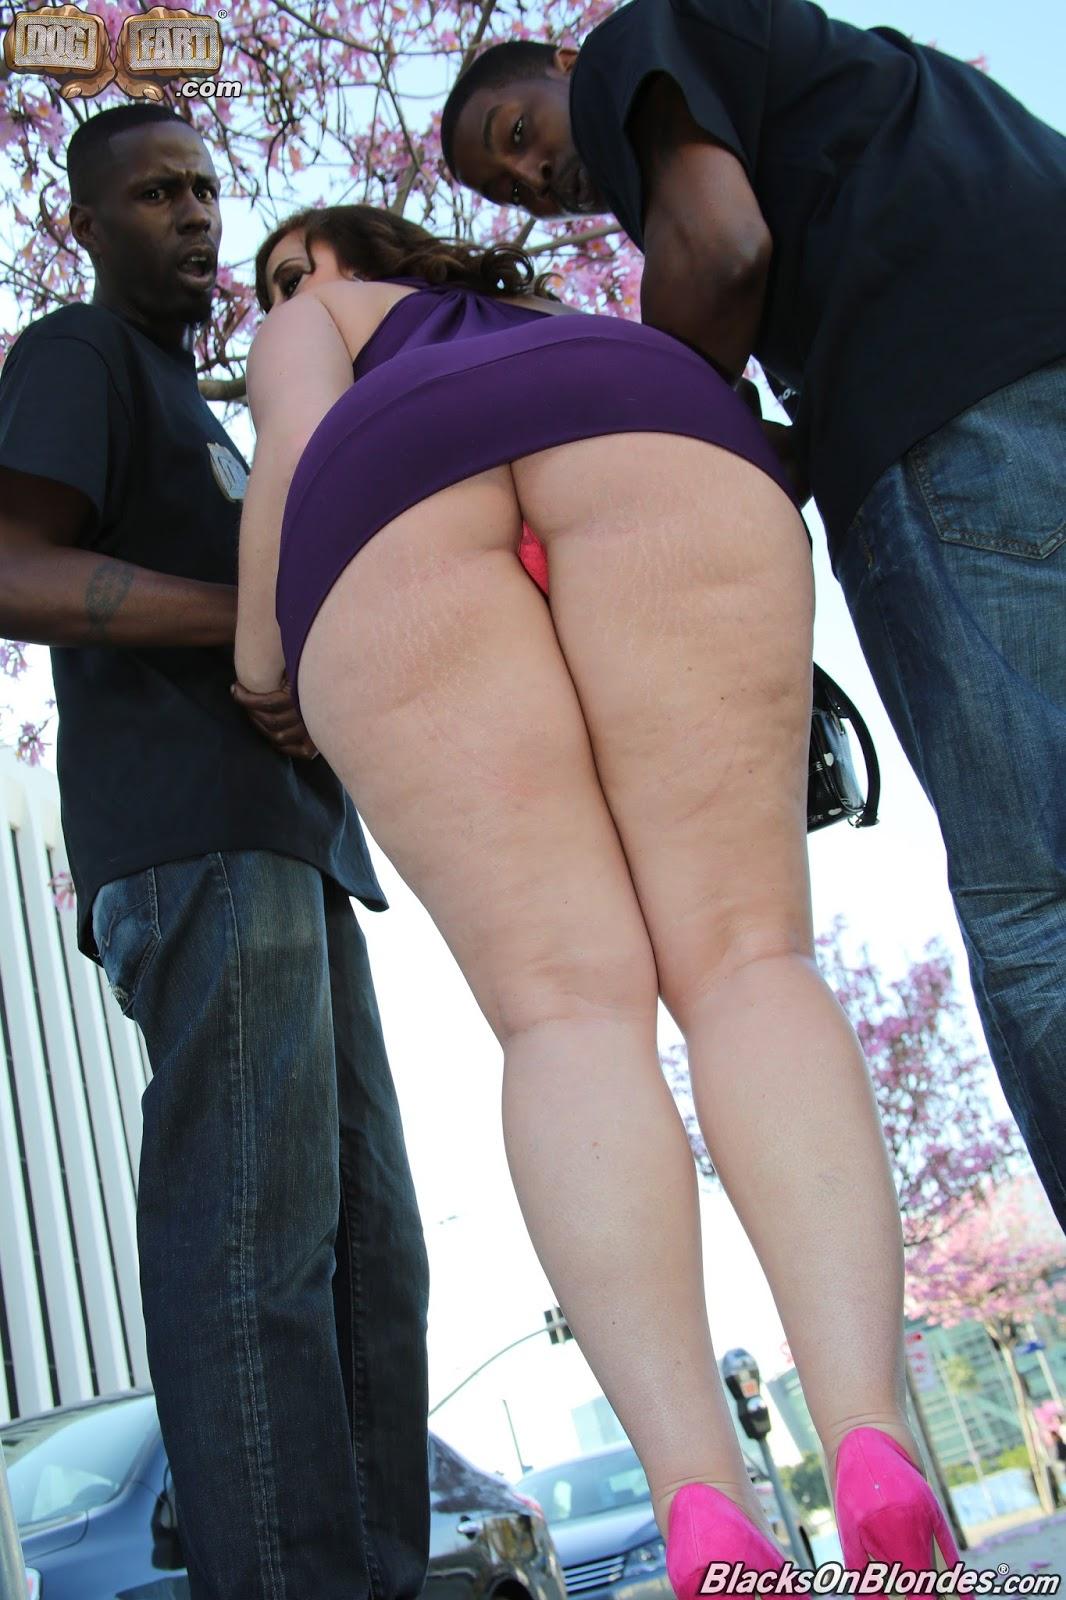 big ass free porn pic